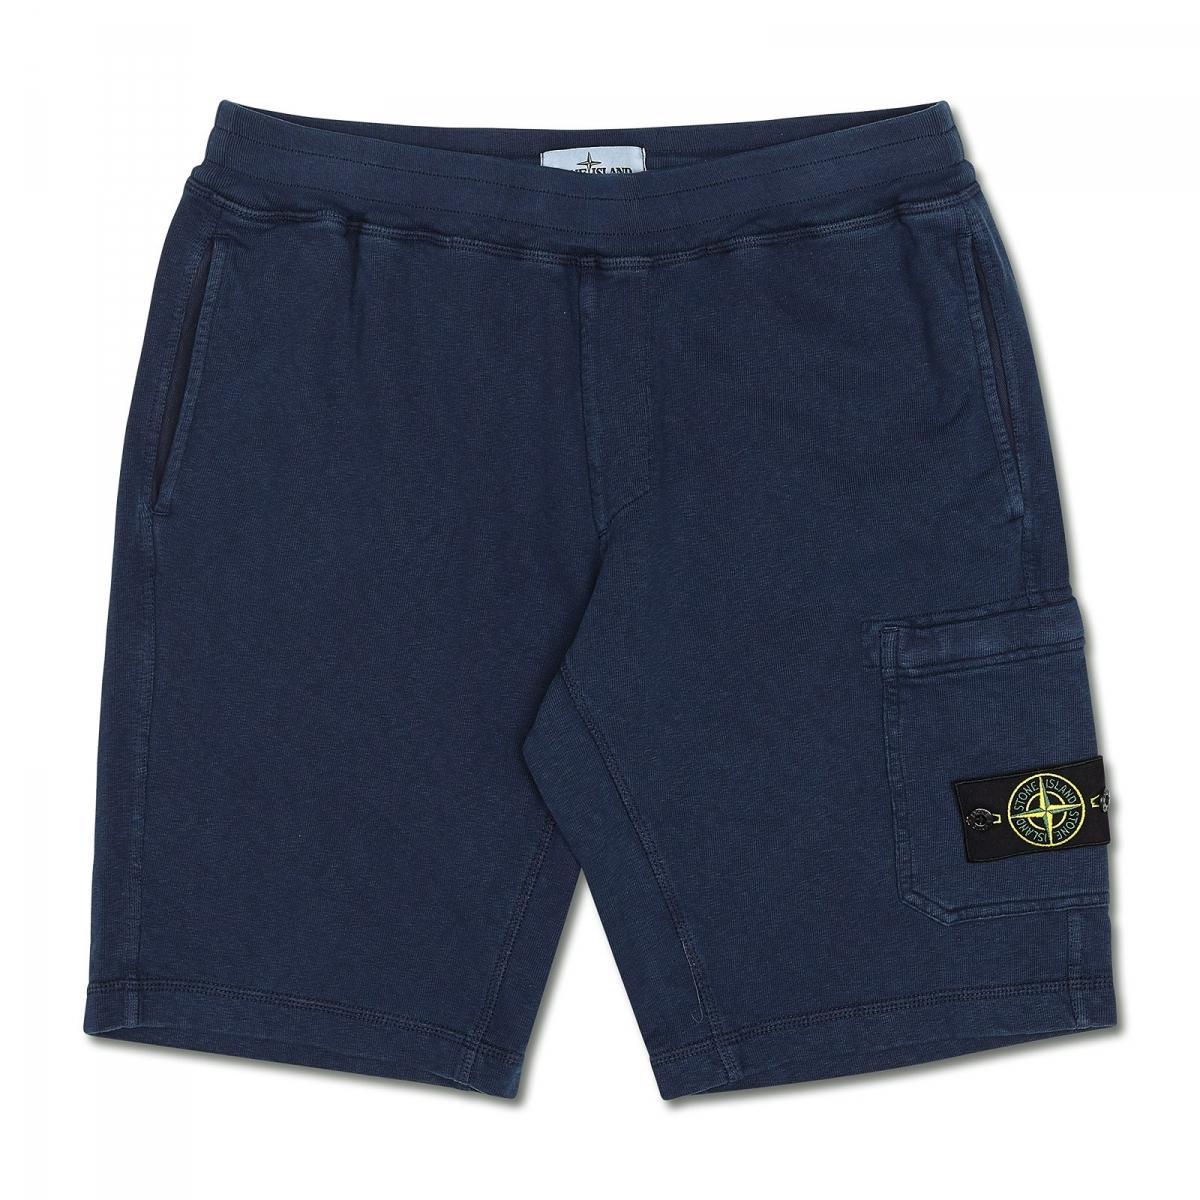 stone island sport short pants in blue for men lyst. Black Bedroom Furniture Sets. Home Design Ideas